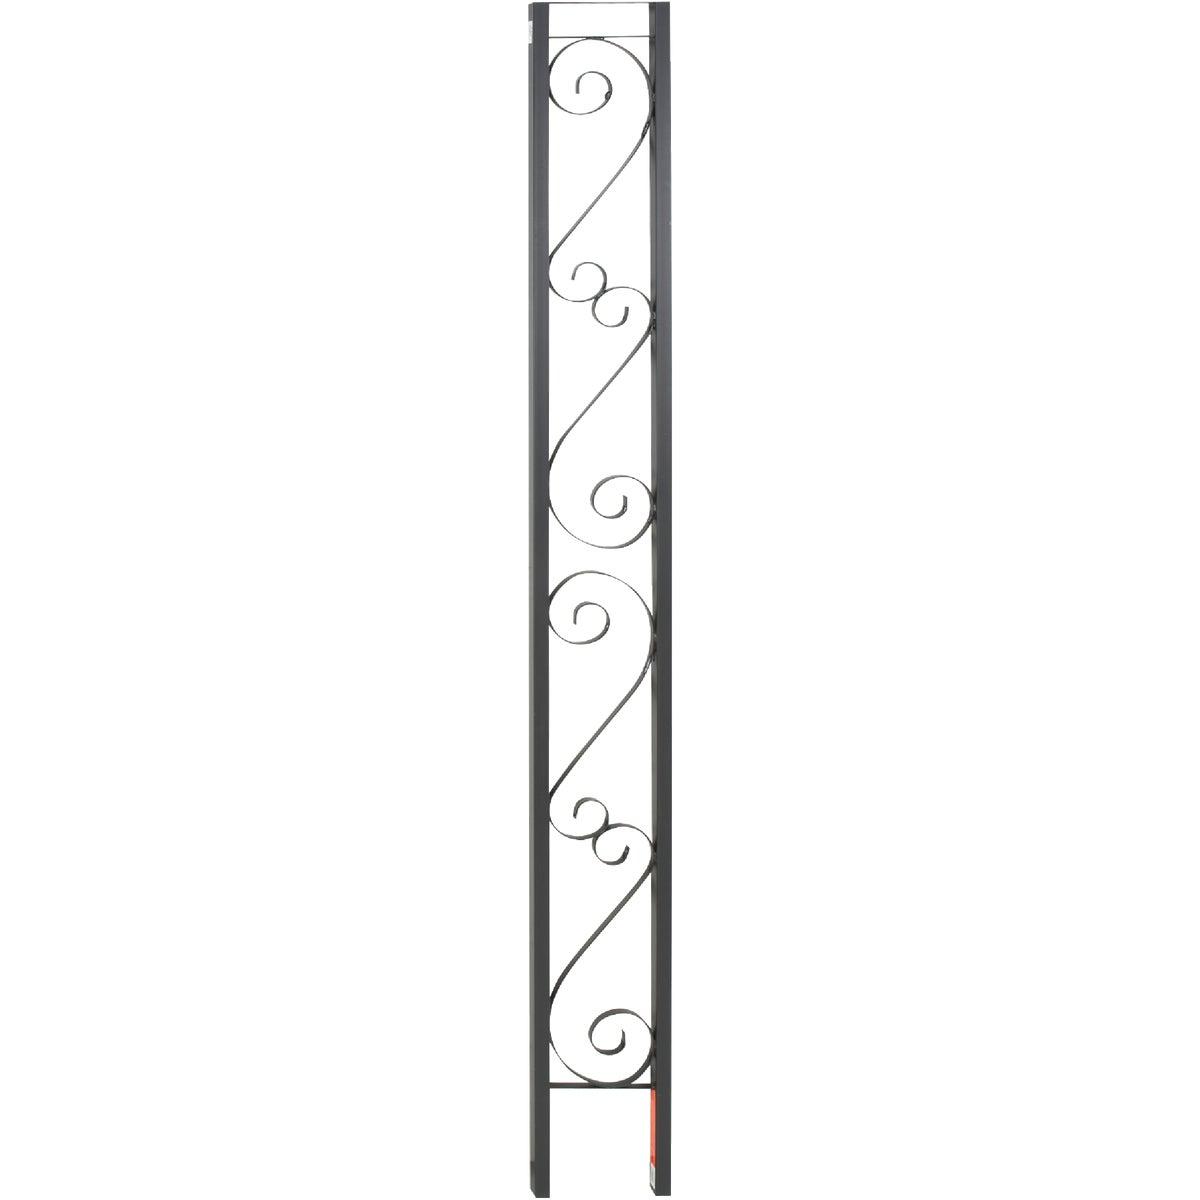 8' Windsor Flat Column